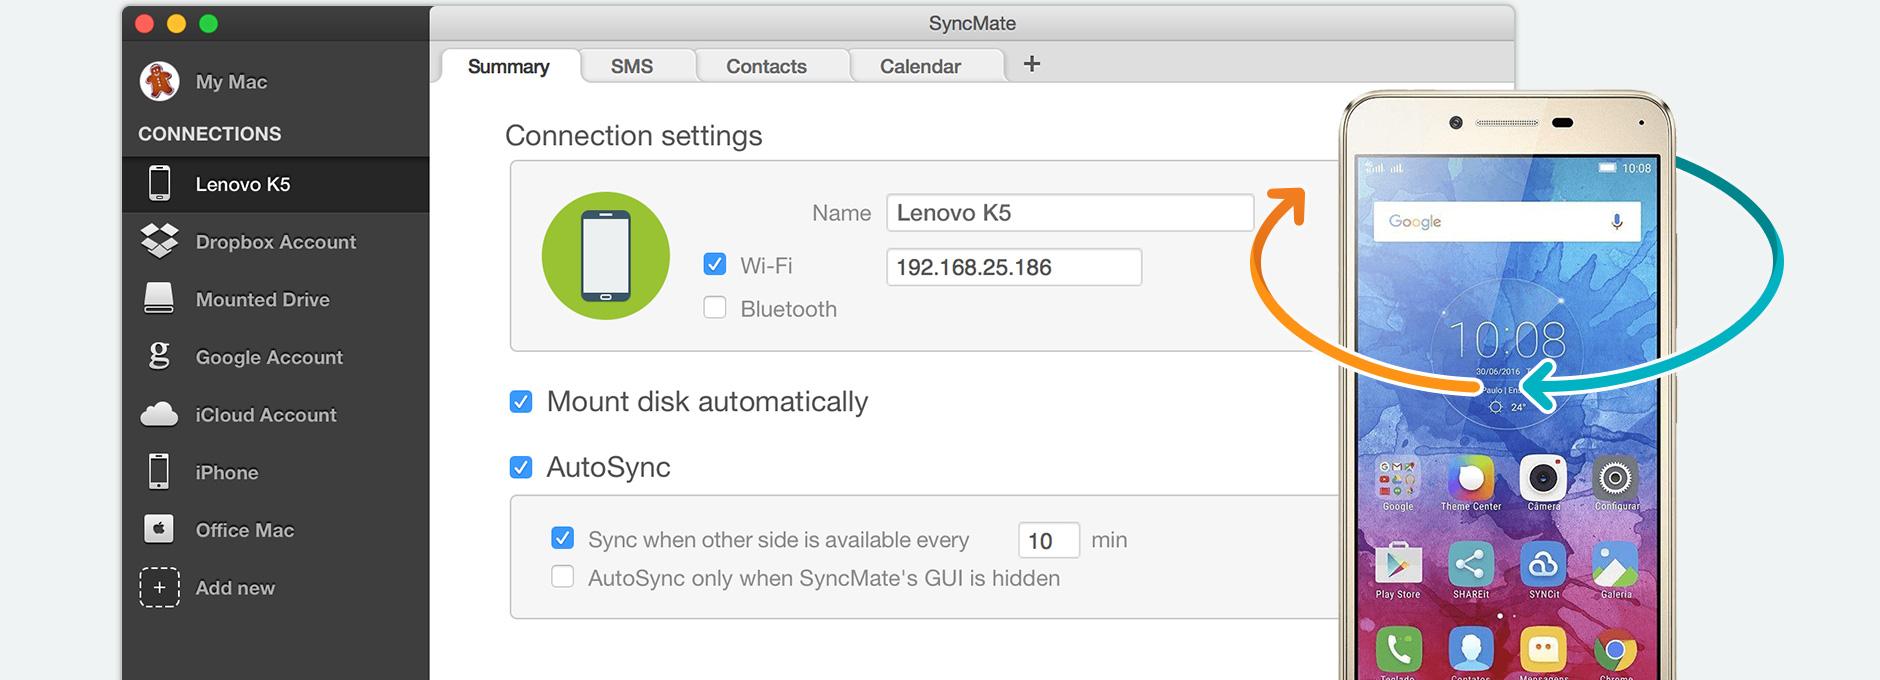 Lenovo sync Mac: synchronize Lenovo and Mac using SyncMate